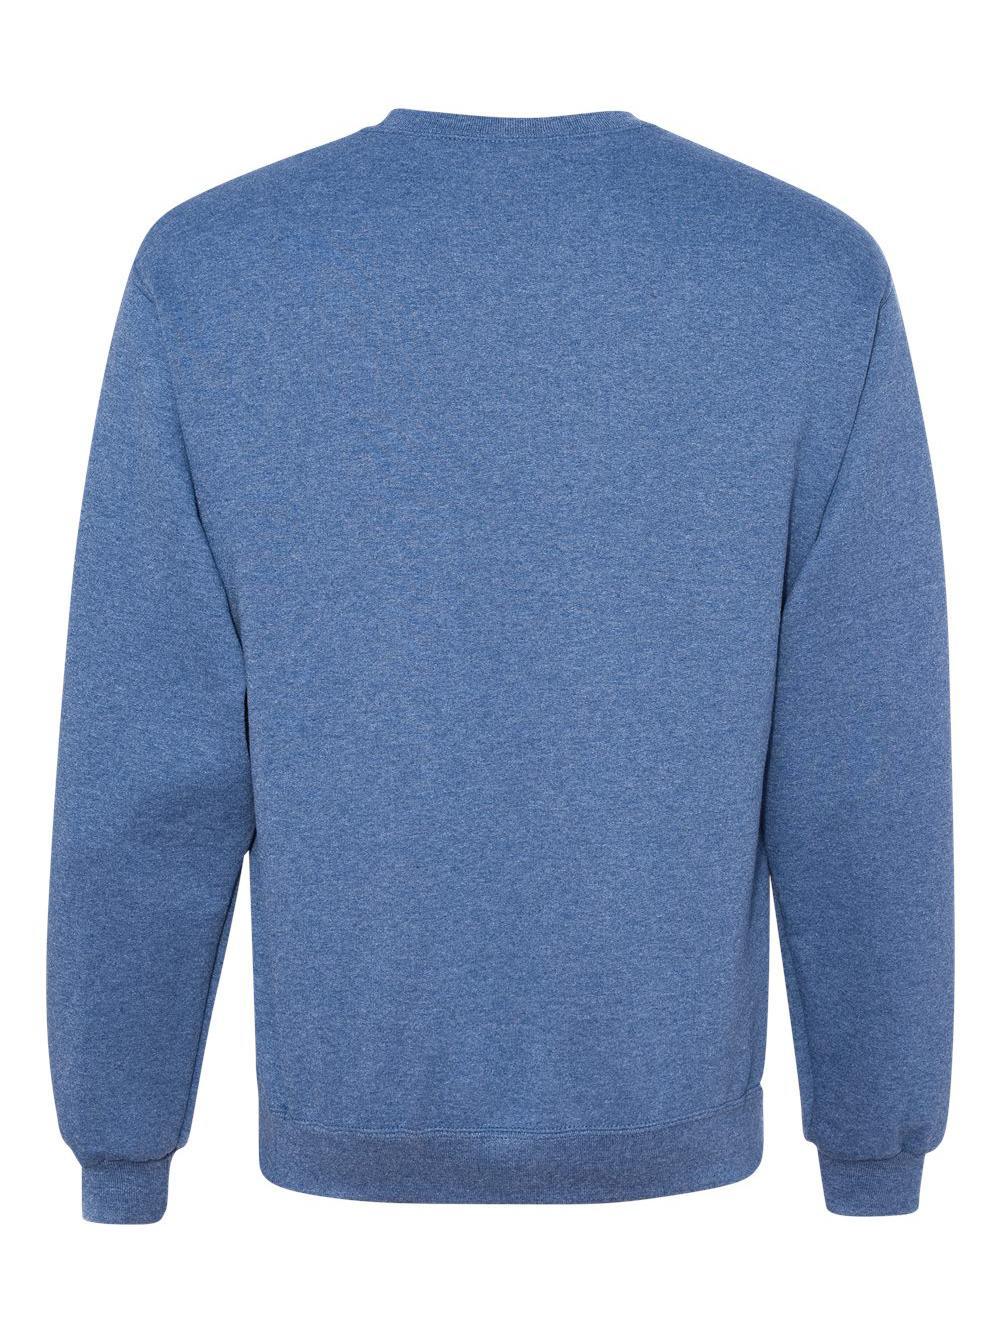 Jerzees-NuBlend-Crewneck-Sweatshirt-562MR thumbnail 94